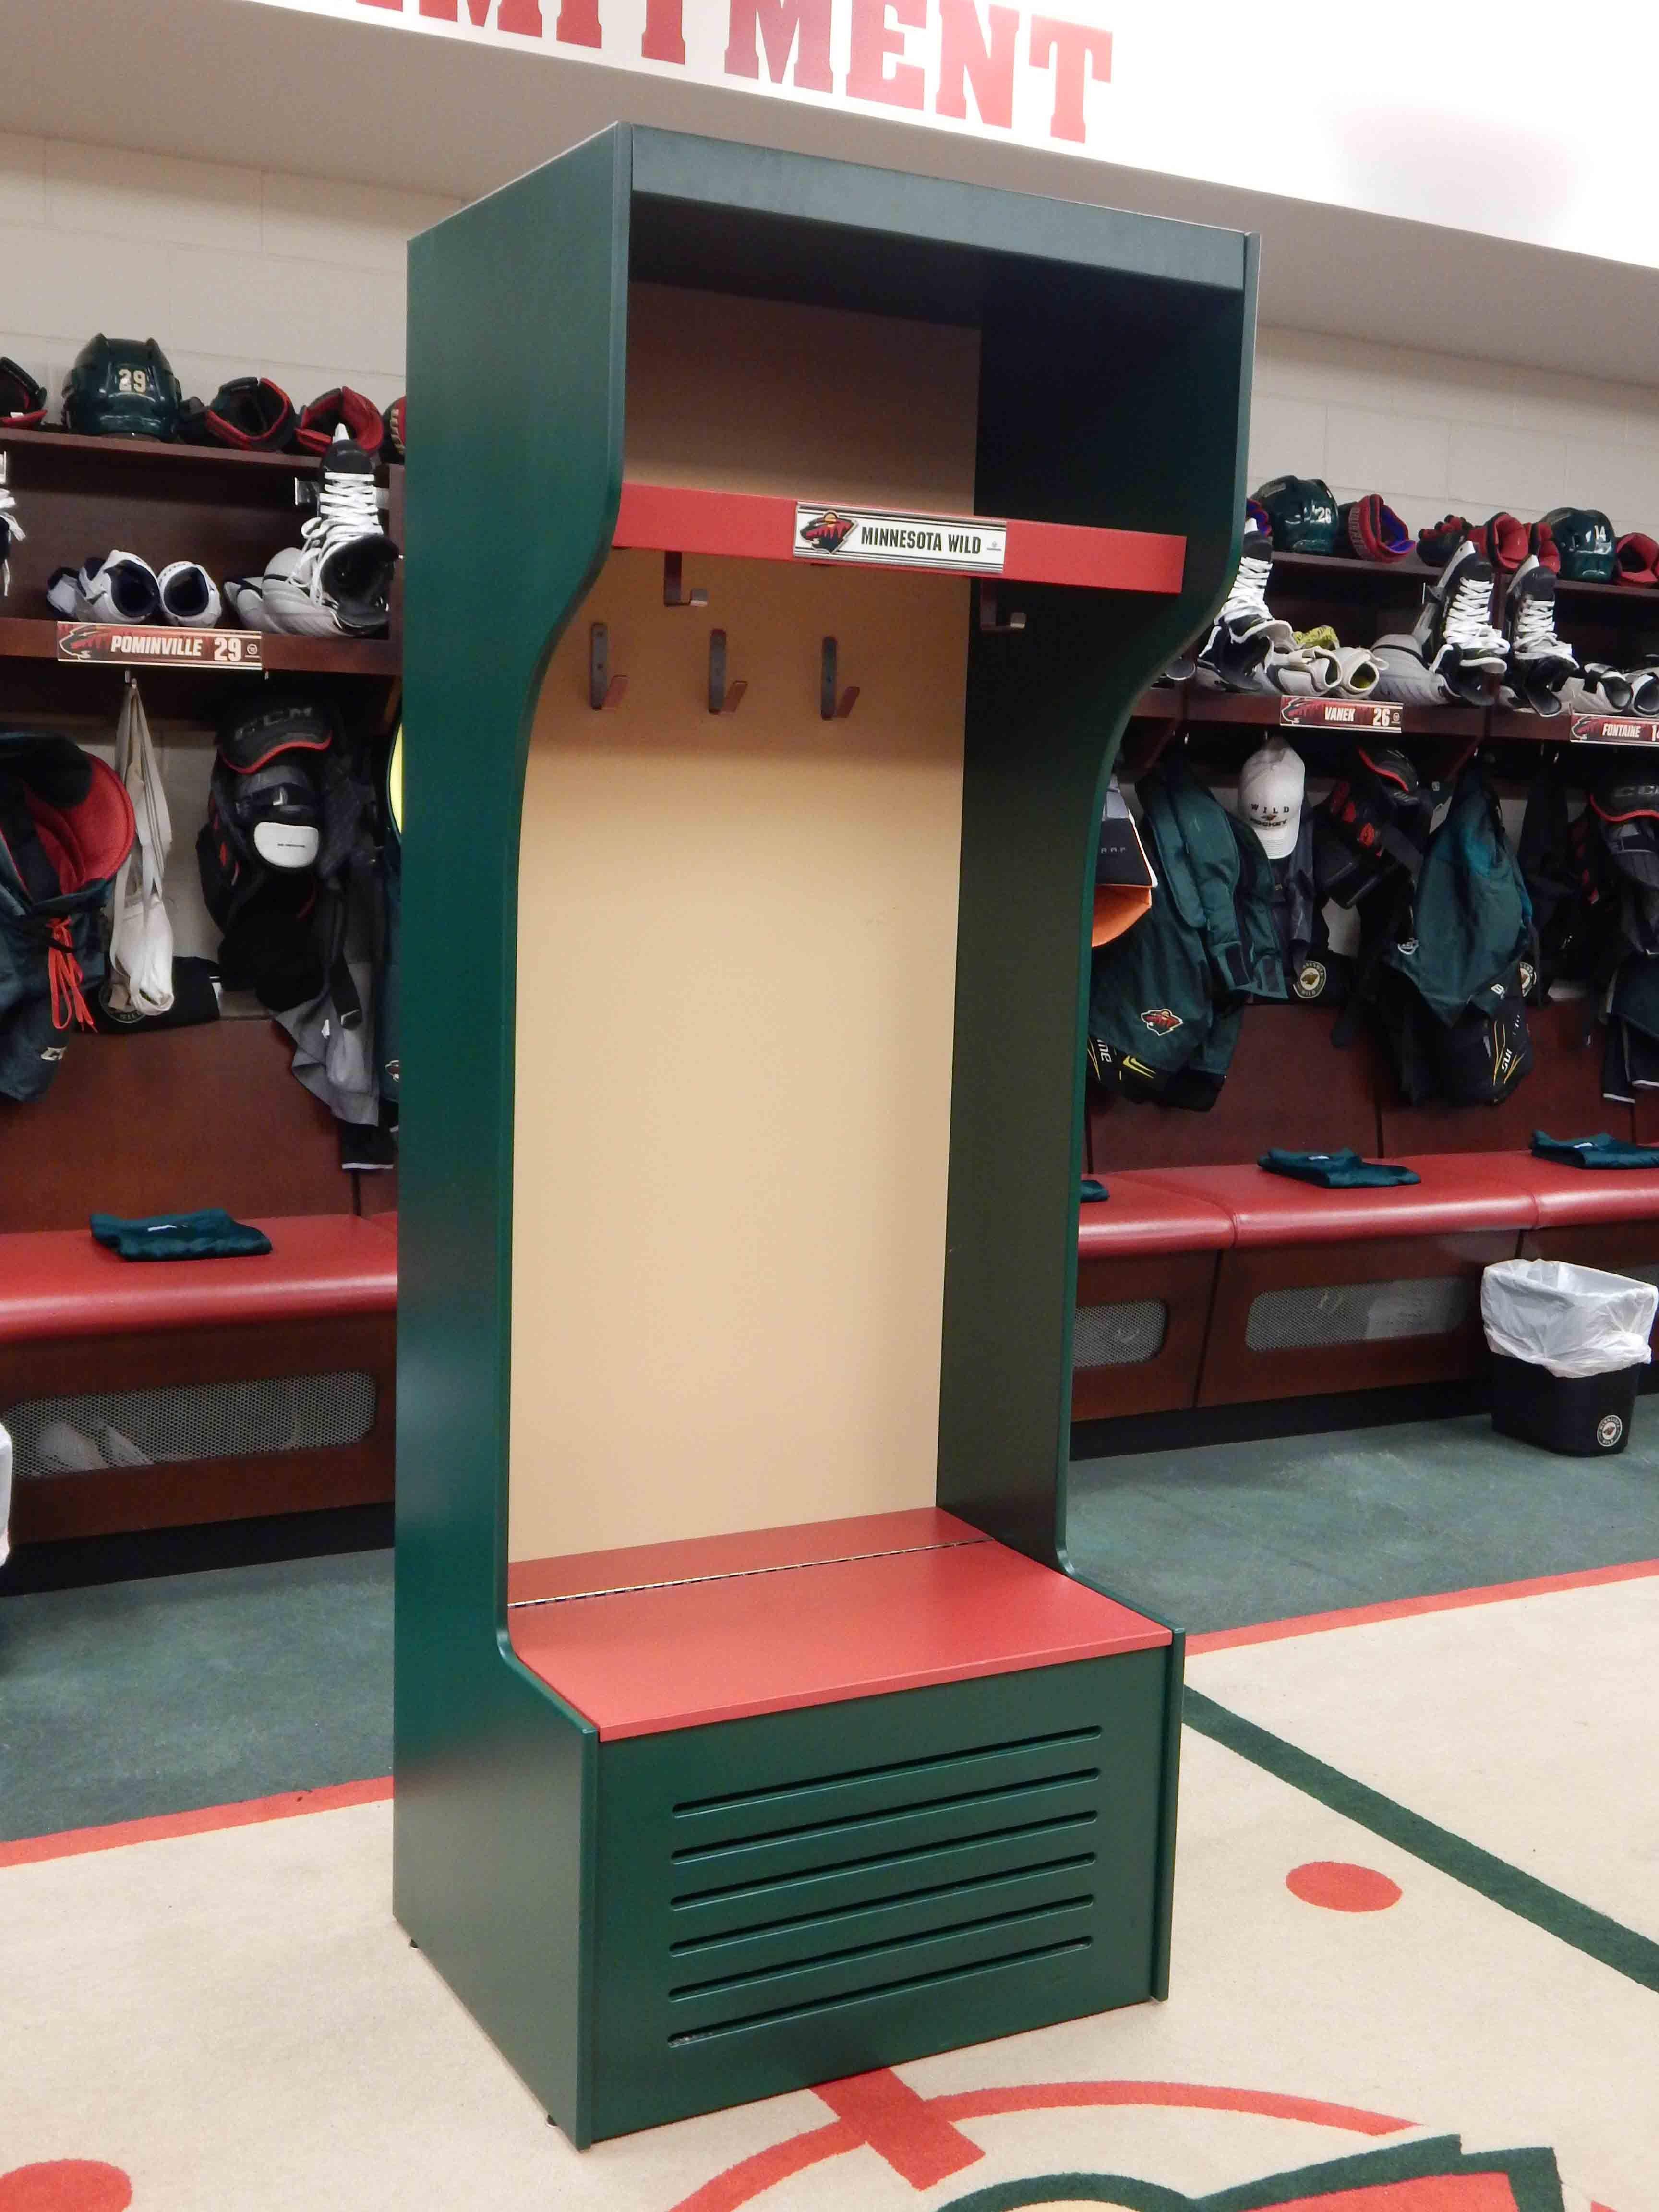 Locker Room Bedroom Free Giveaway Win A Free Hockey Locker 735 Value Enter Here